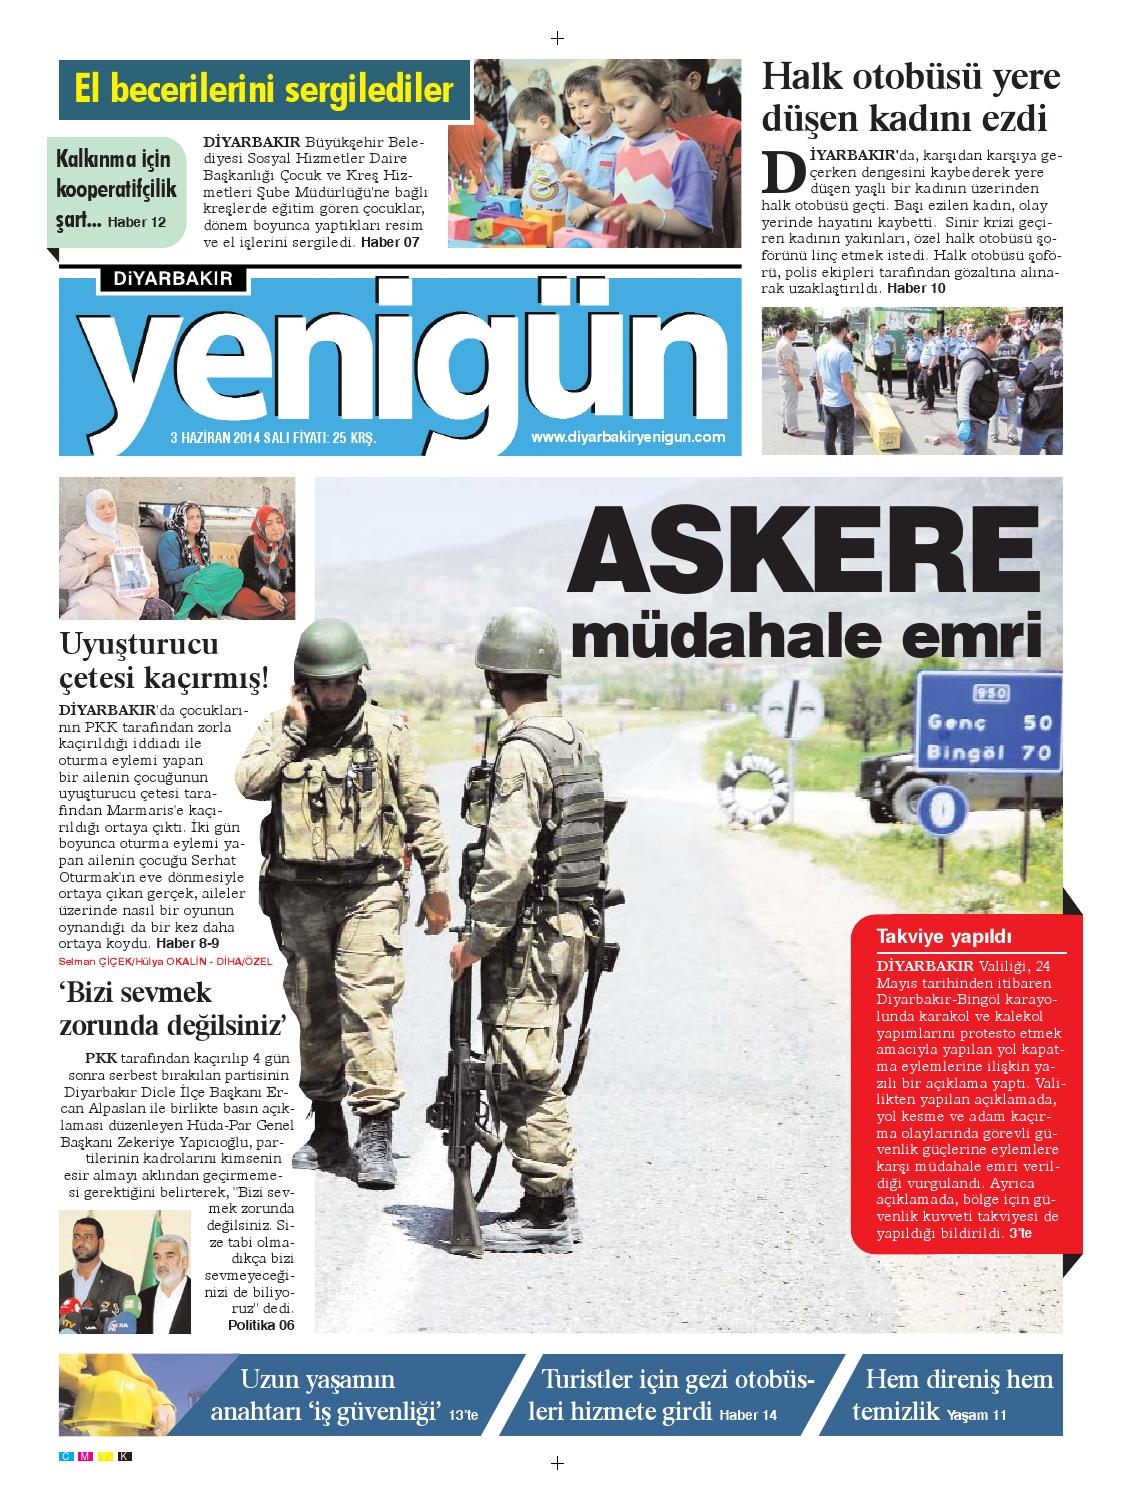 Diyarbakir Yenigun Gazetesi 3 Haziran 2014 By Osman Ergun Issuu